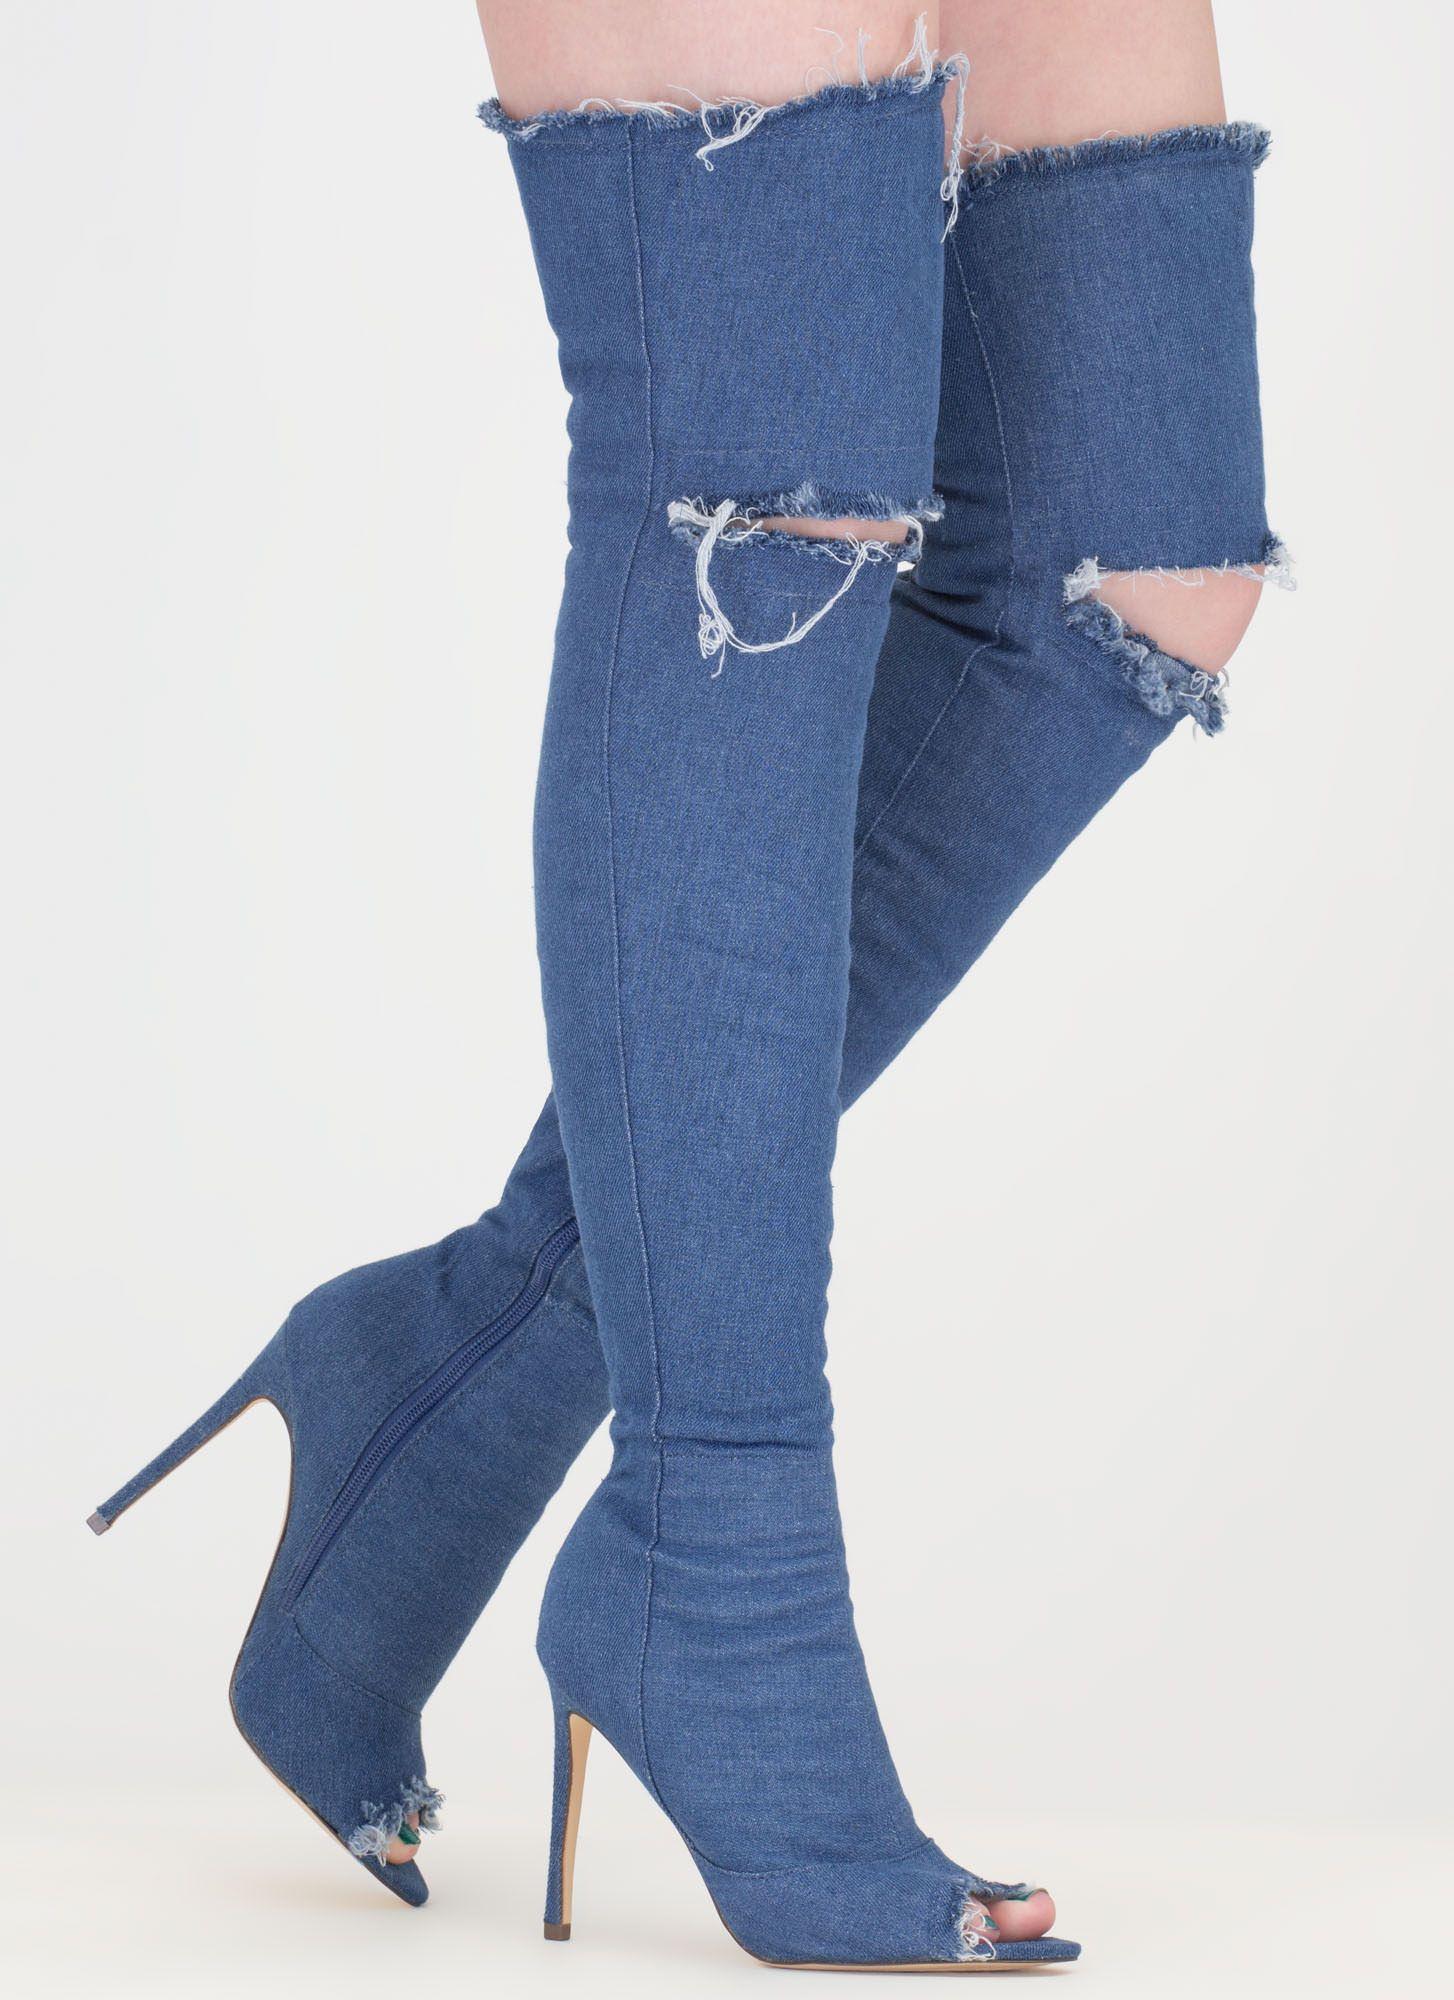 Distress Signal Denim Thigh-High Boots BLACK MEDIUMBLUE GREY ...